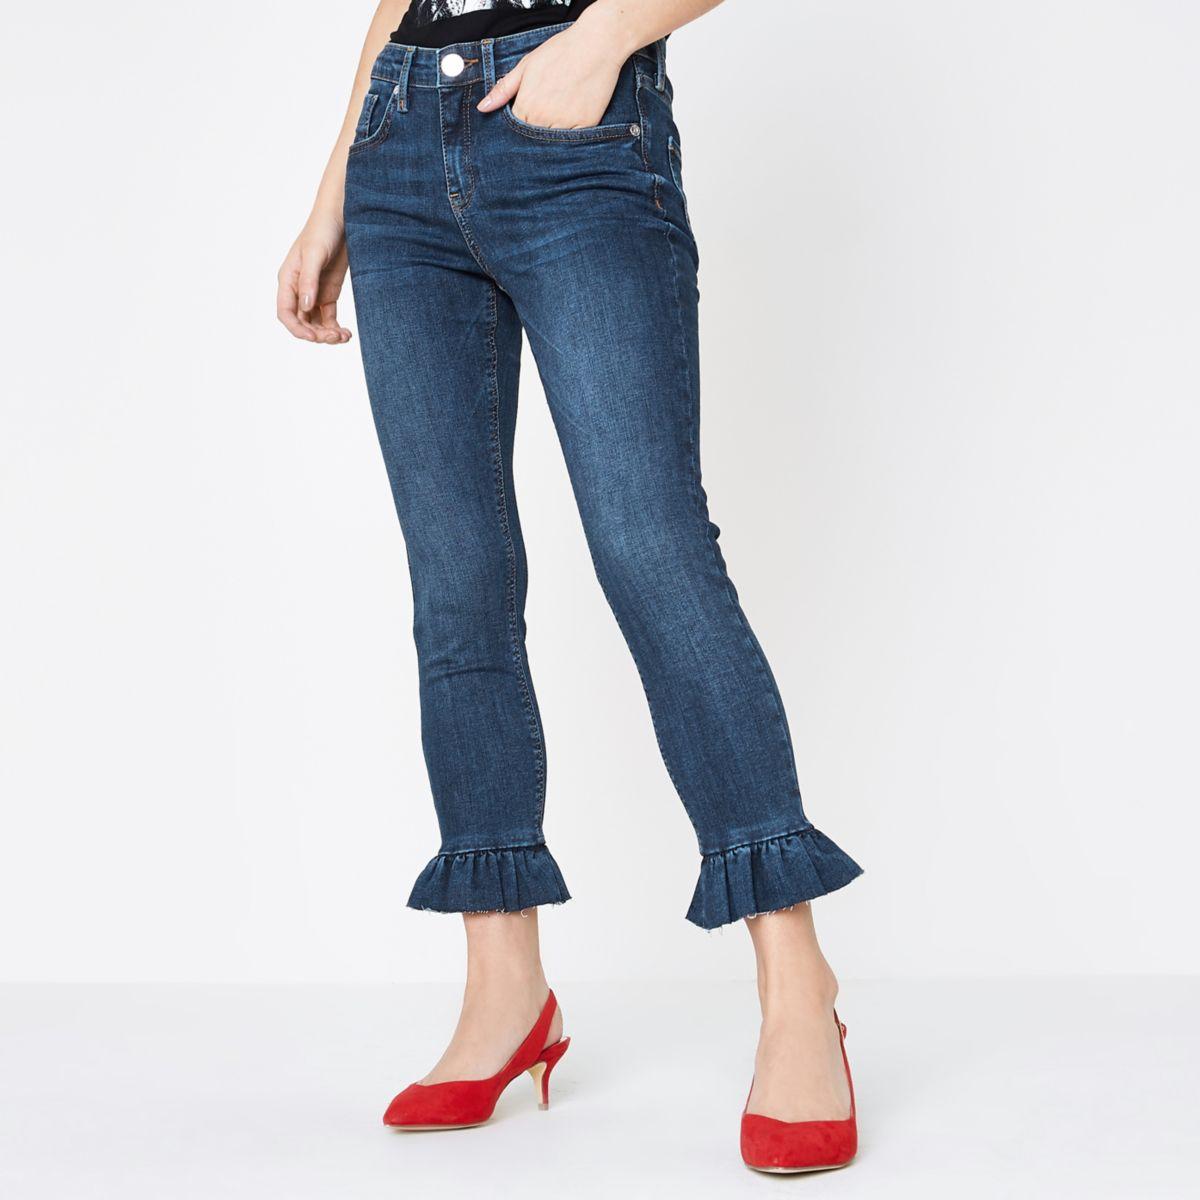 Petite blue Amelie frill super skinny jeans